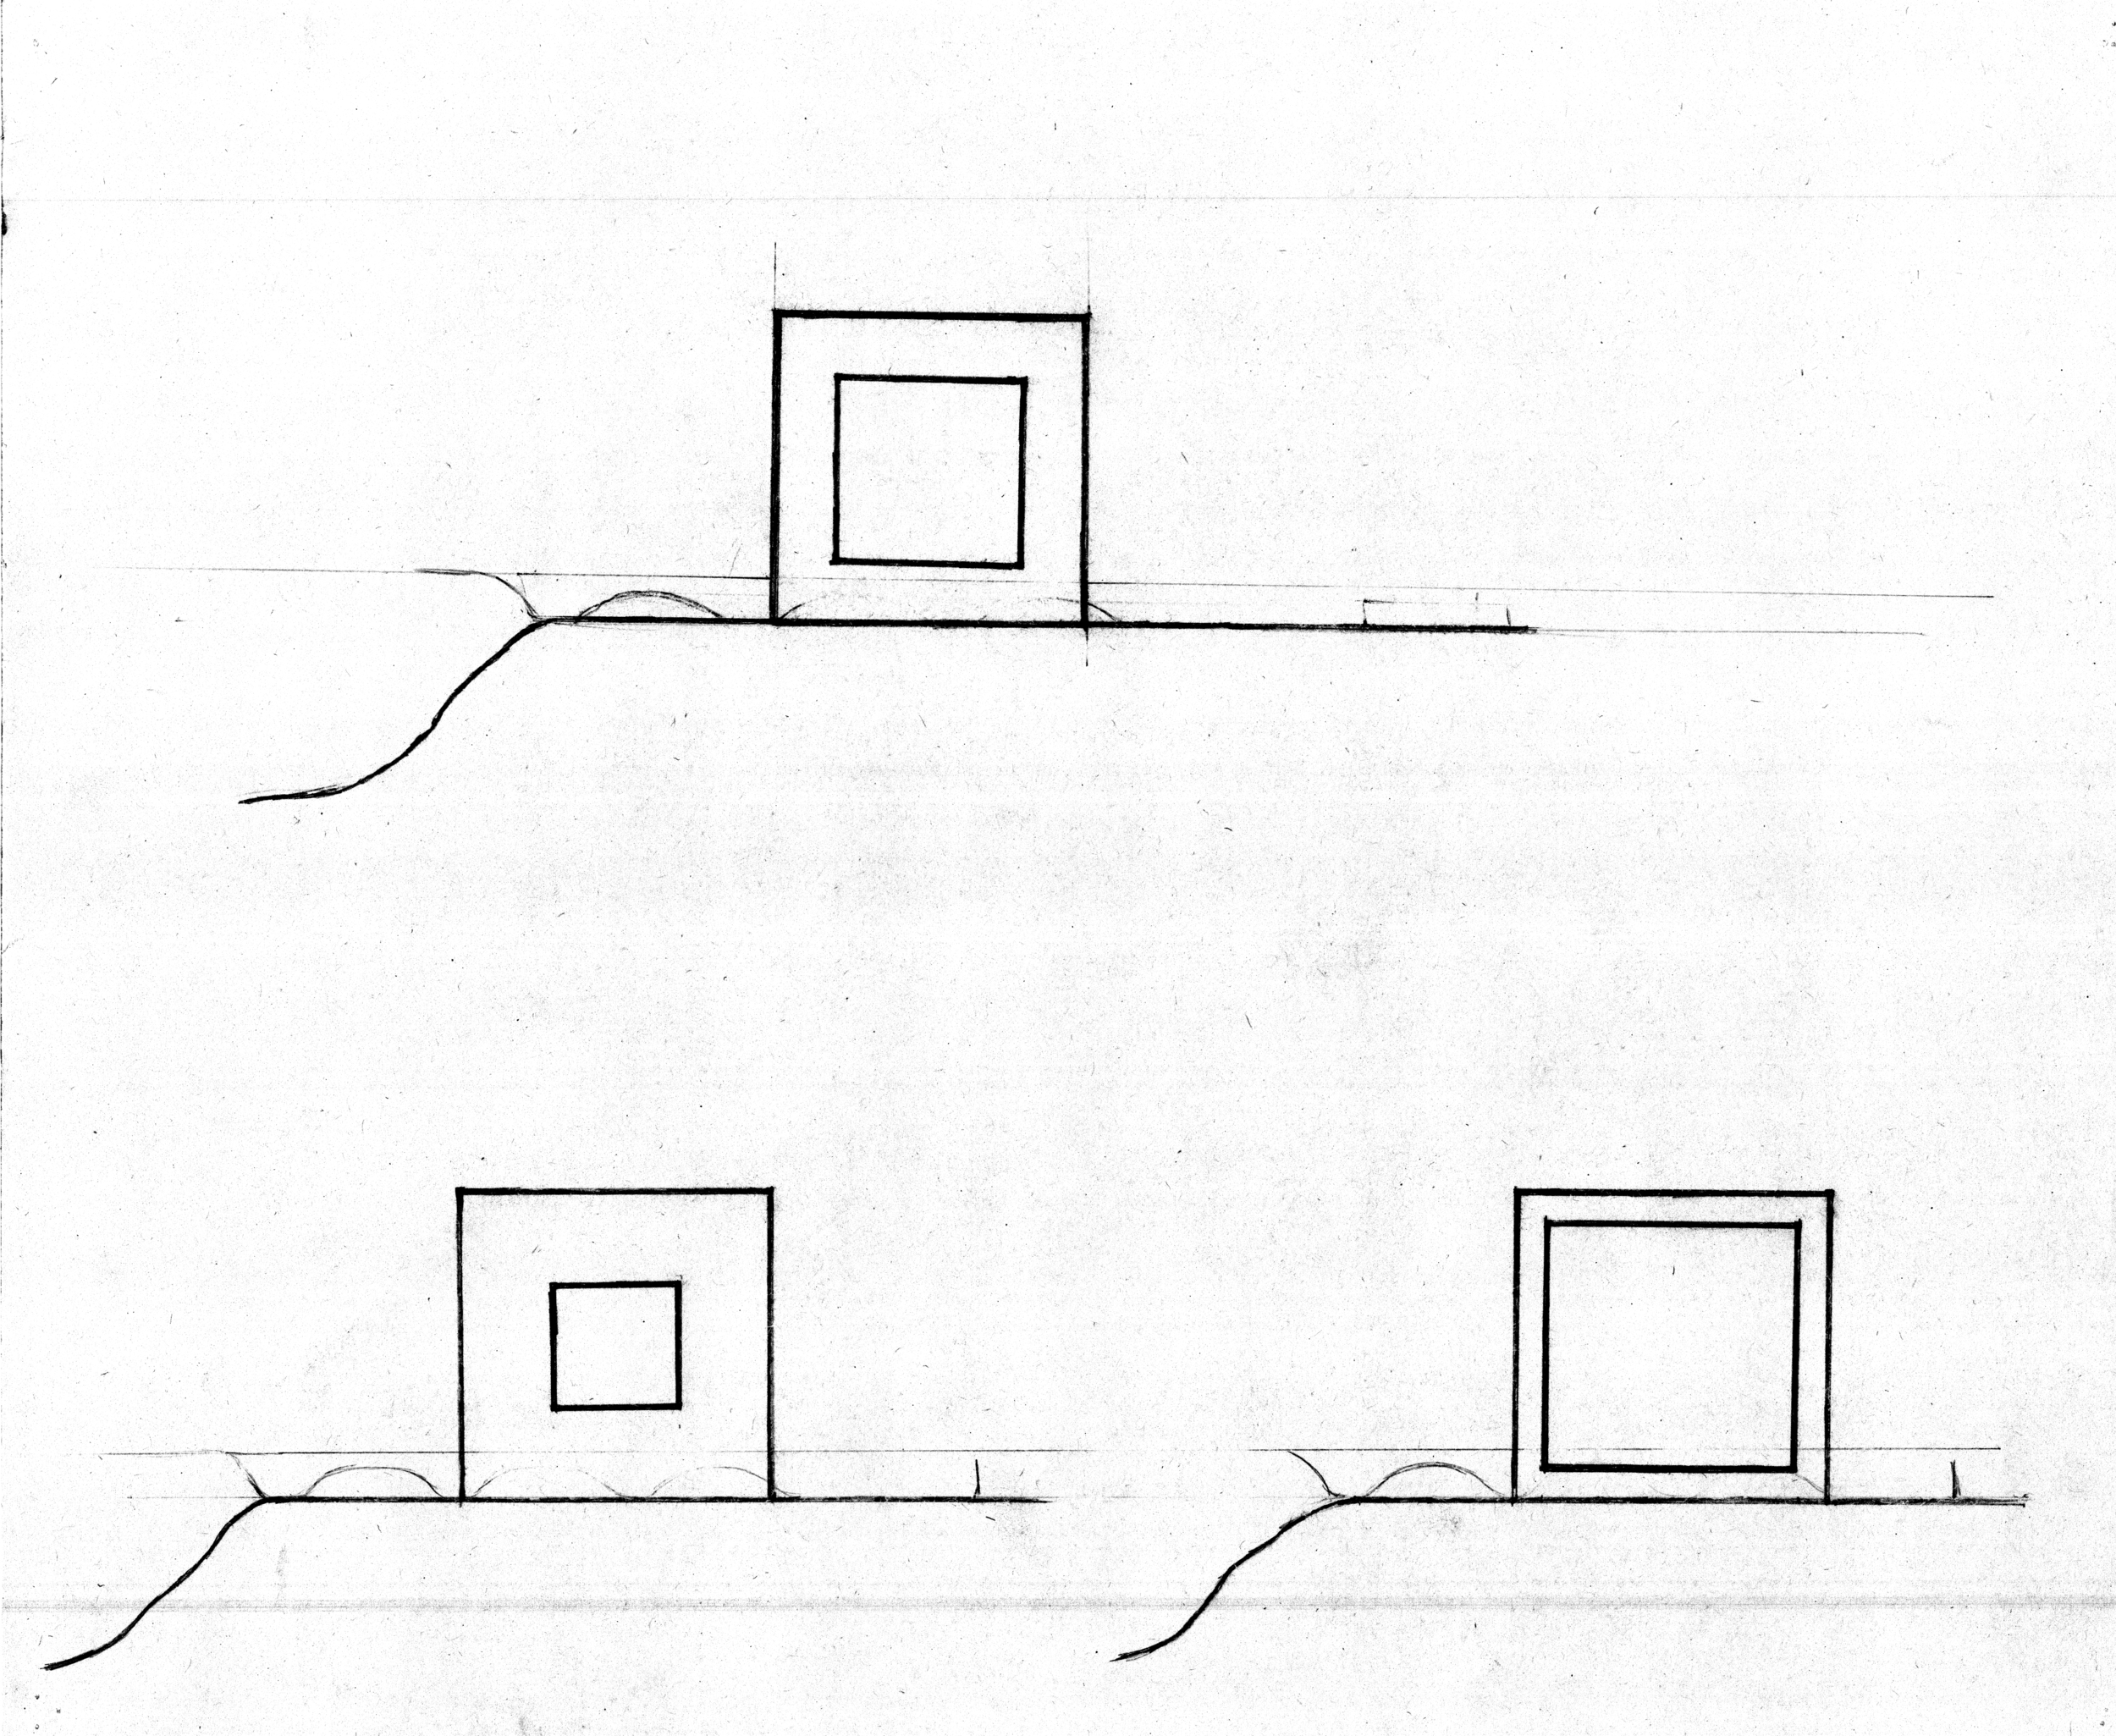 Alvarez_2Y_1S_Study6 (2).jpg